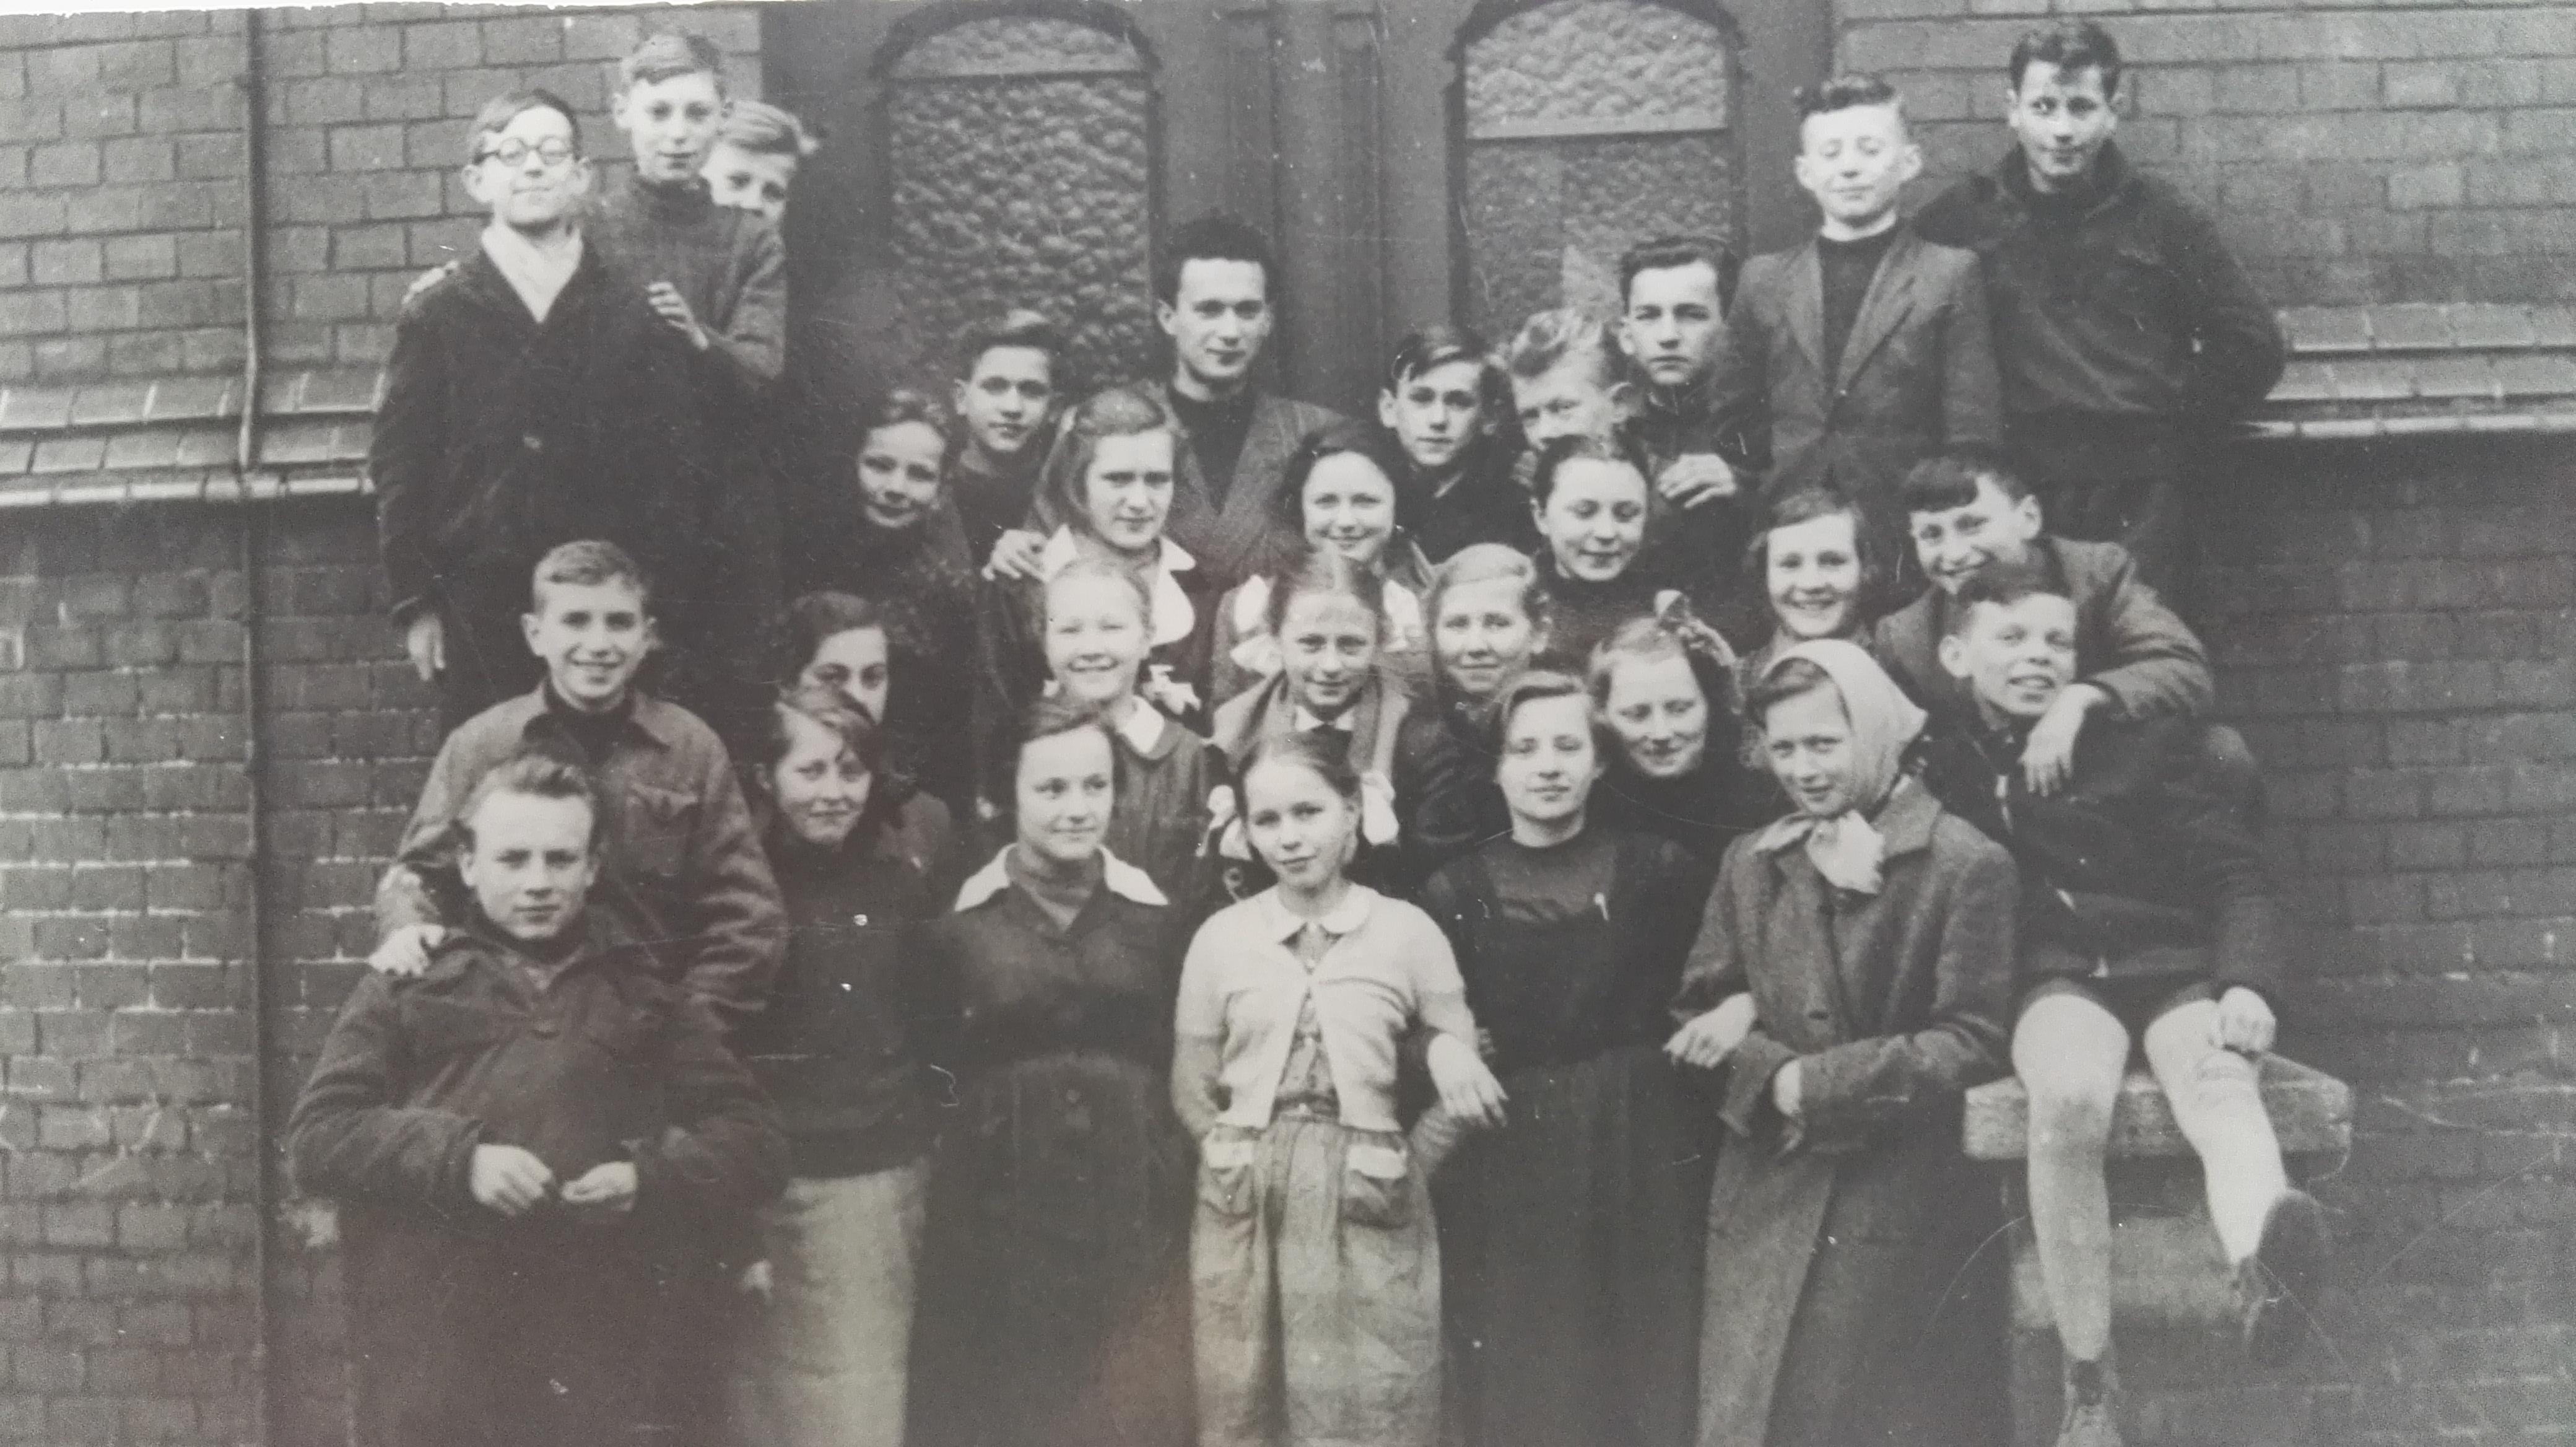 Artwork from the book - זכרונות מתולדות משפחתי: מספר שאול יגודז'ינסקי by Yoged - יגודז